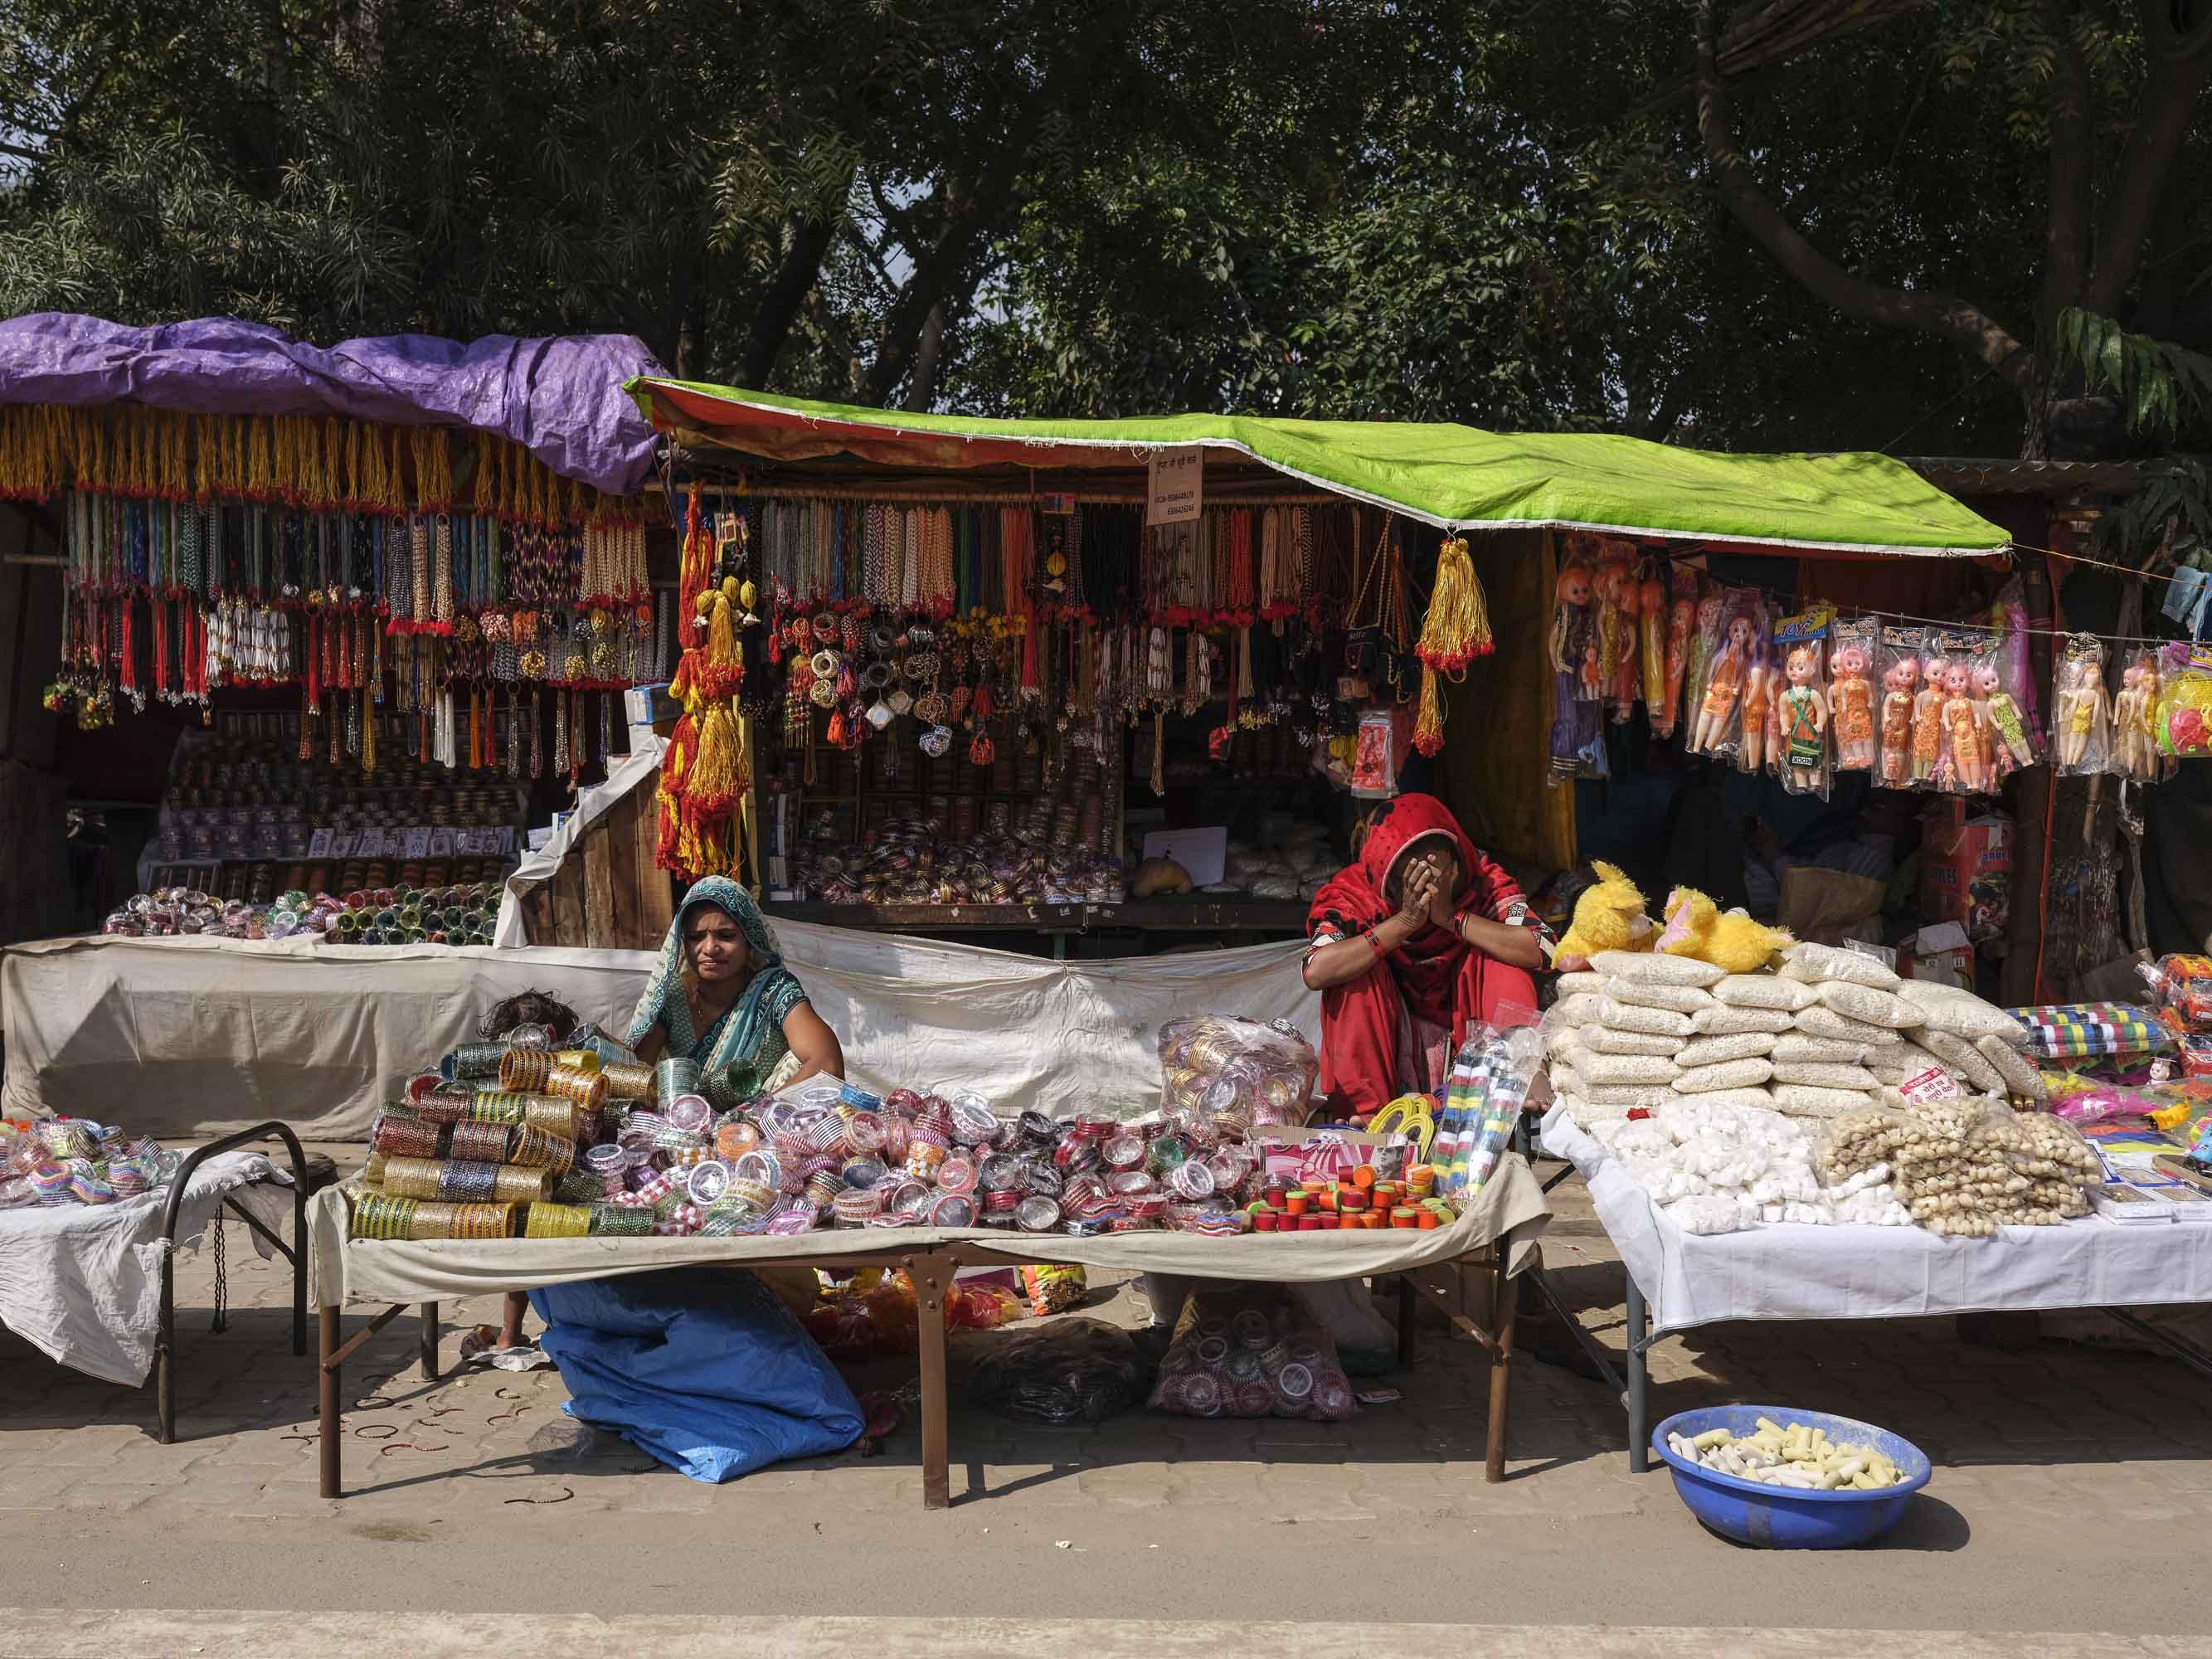 market store camp pilgrims Kumbh mela 2019 India Allahabad Prayagraj Ardh hindu religious Festival event rivers photographer jose jeuland photography